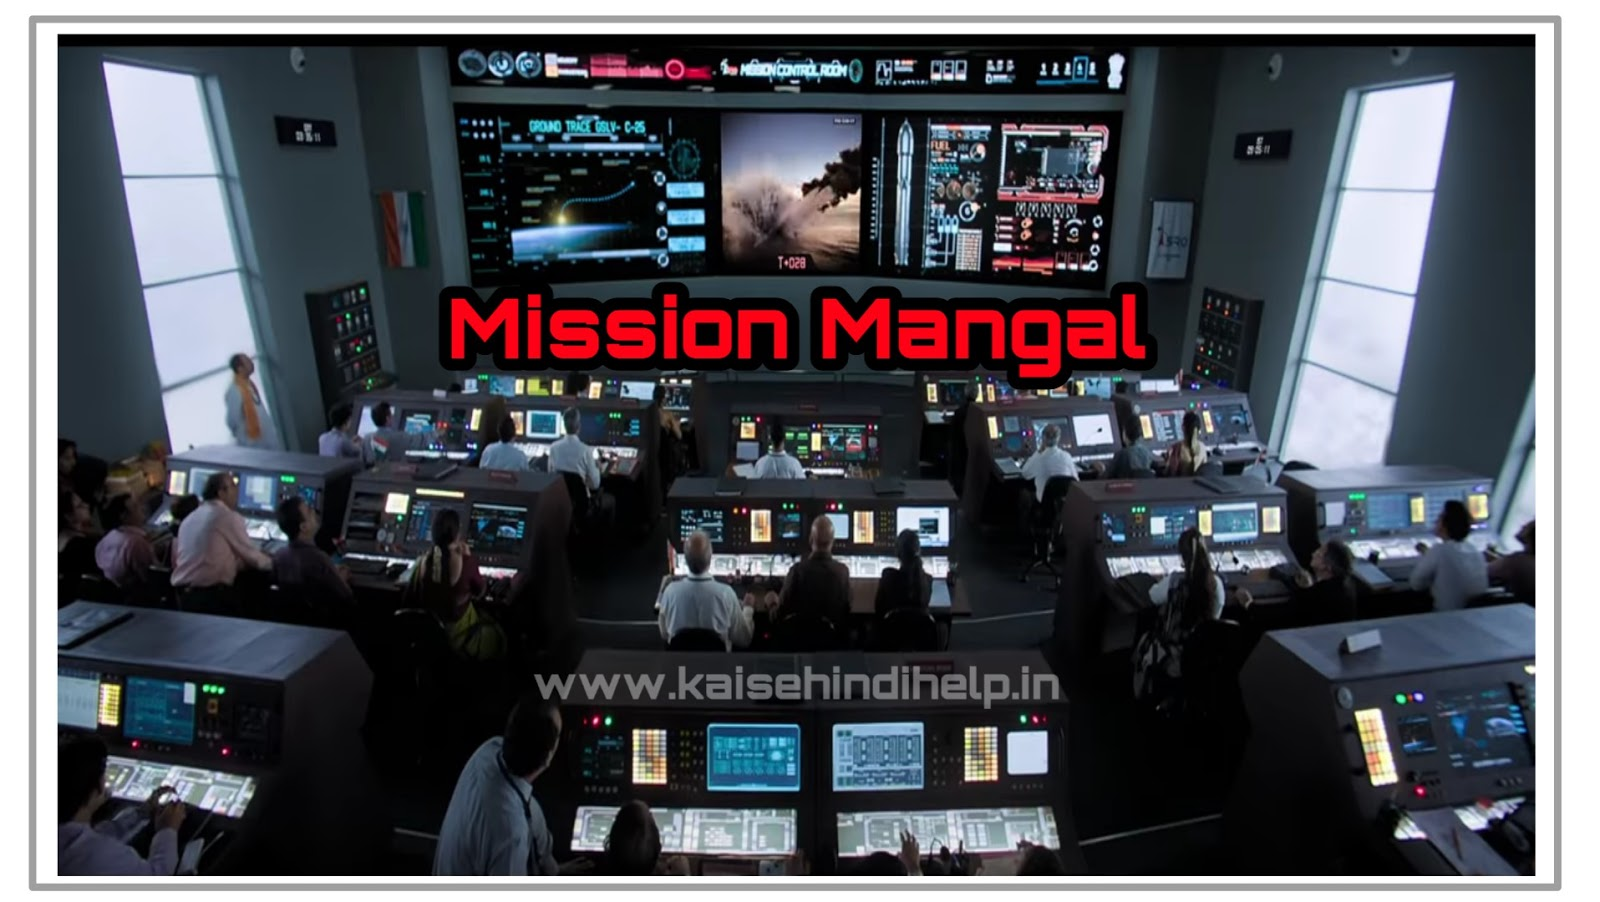 mission mangal movie ko download kaise kare